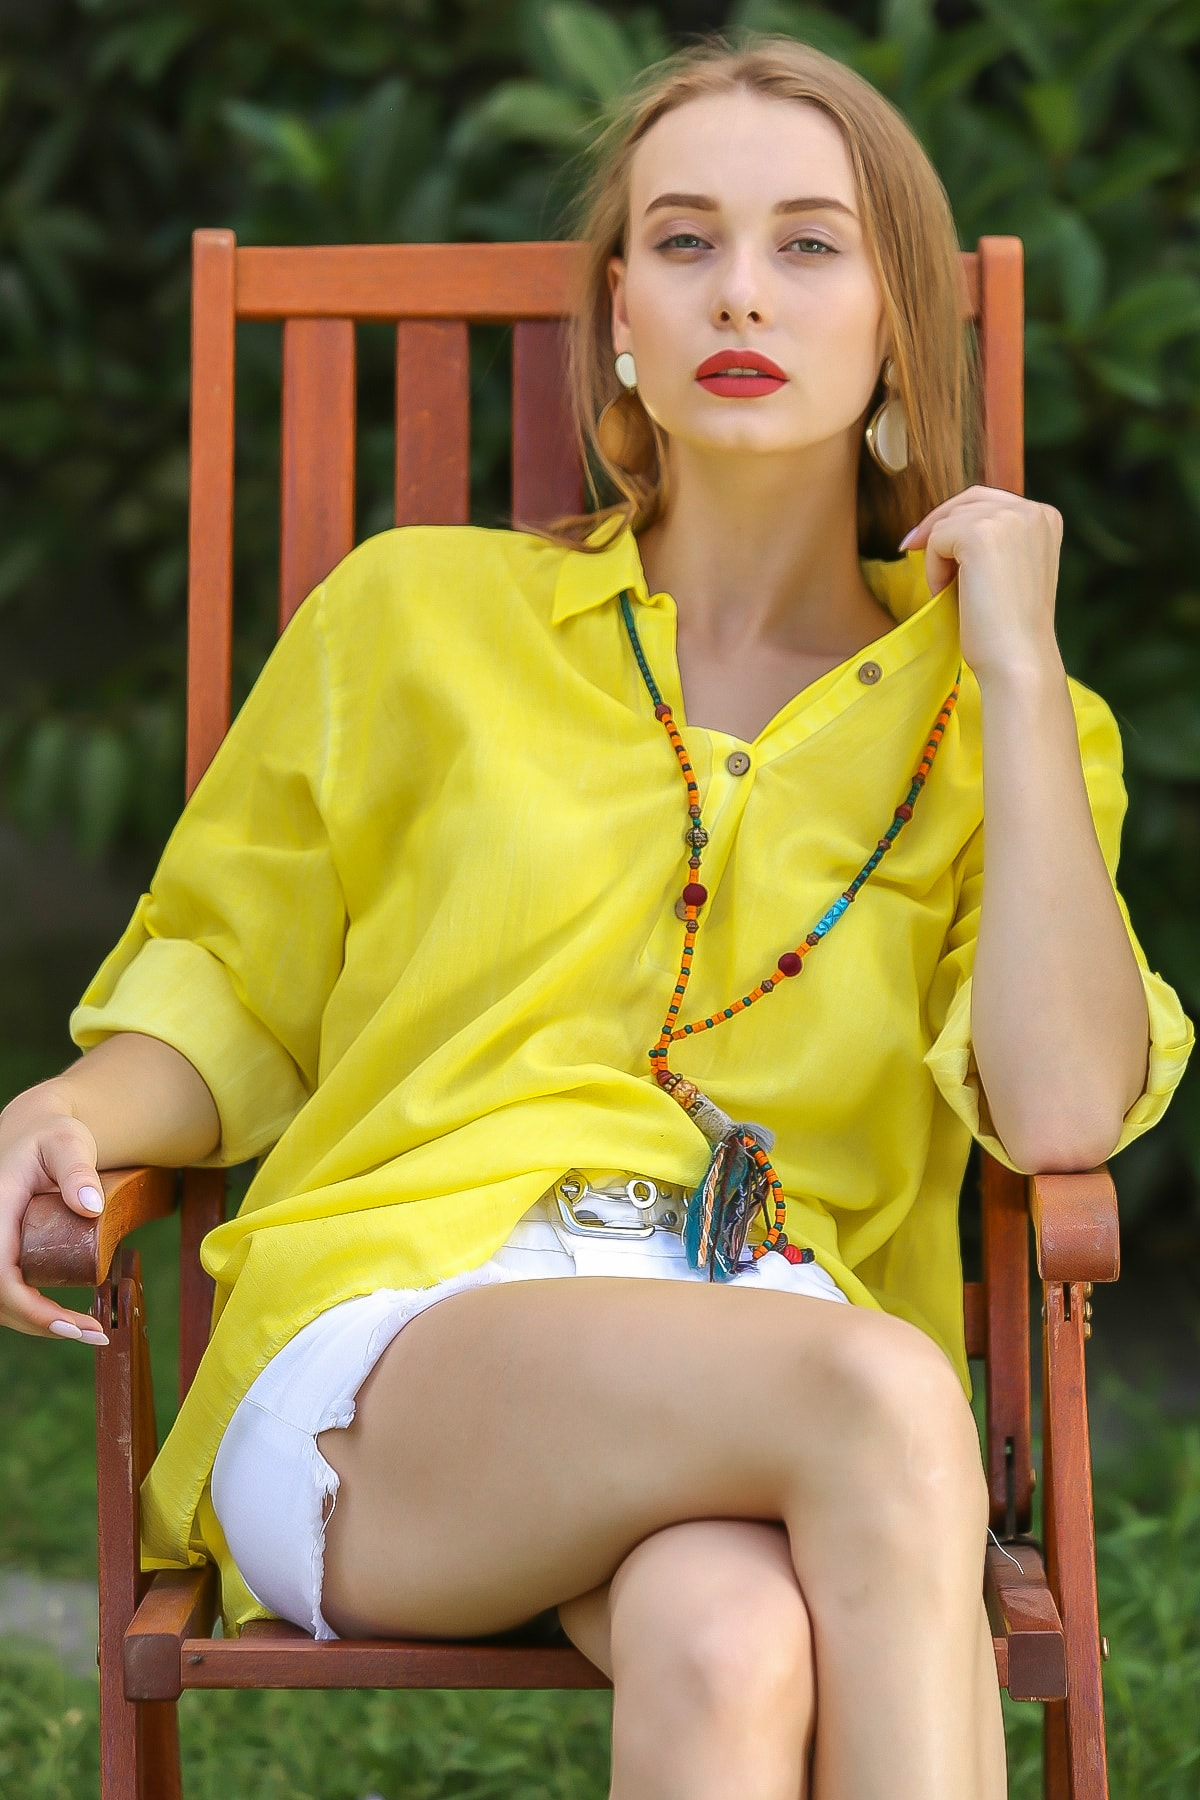 Chiccy Kadın Neon Sarı Casual Gömlek Yaka Pat Detaylı Yıkamalı Tunik Bluz M10010200Bl96076 3